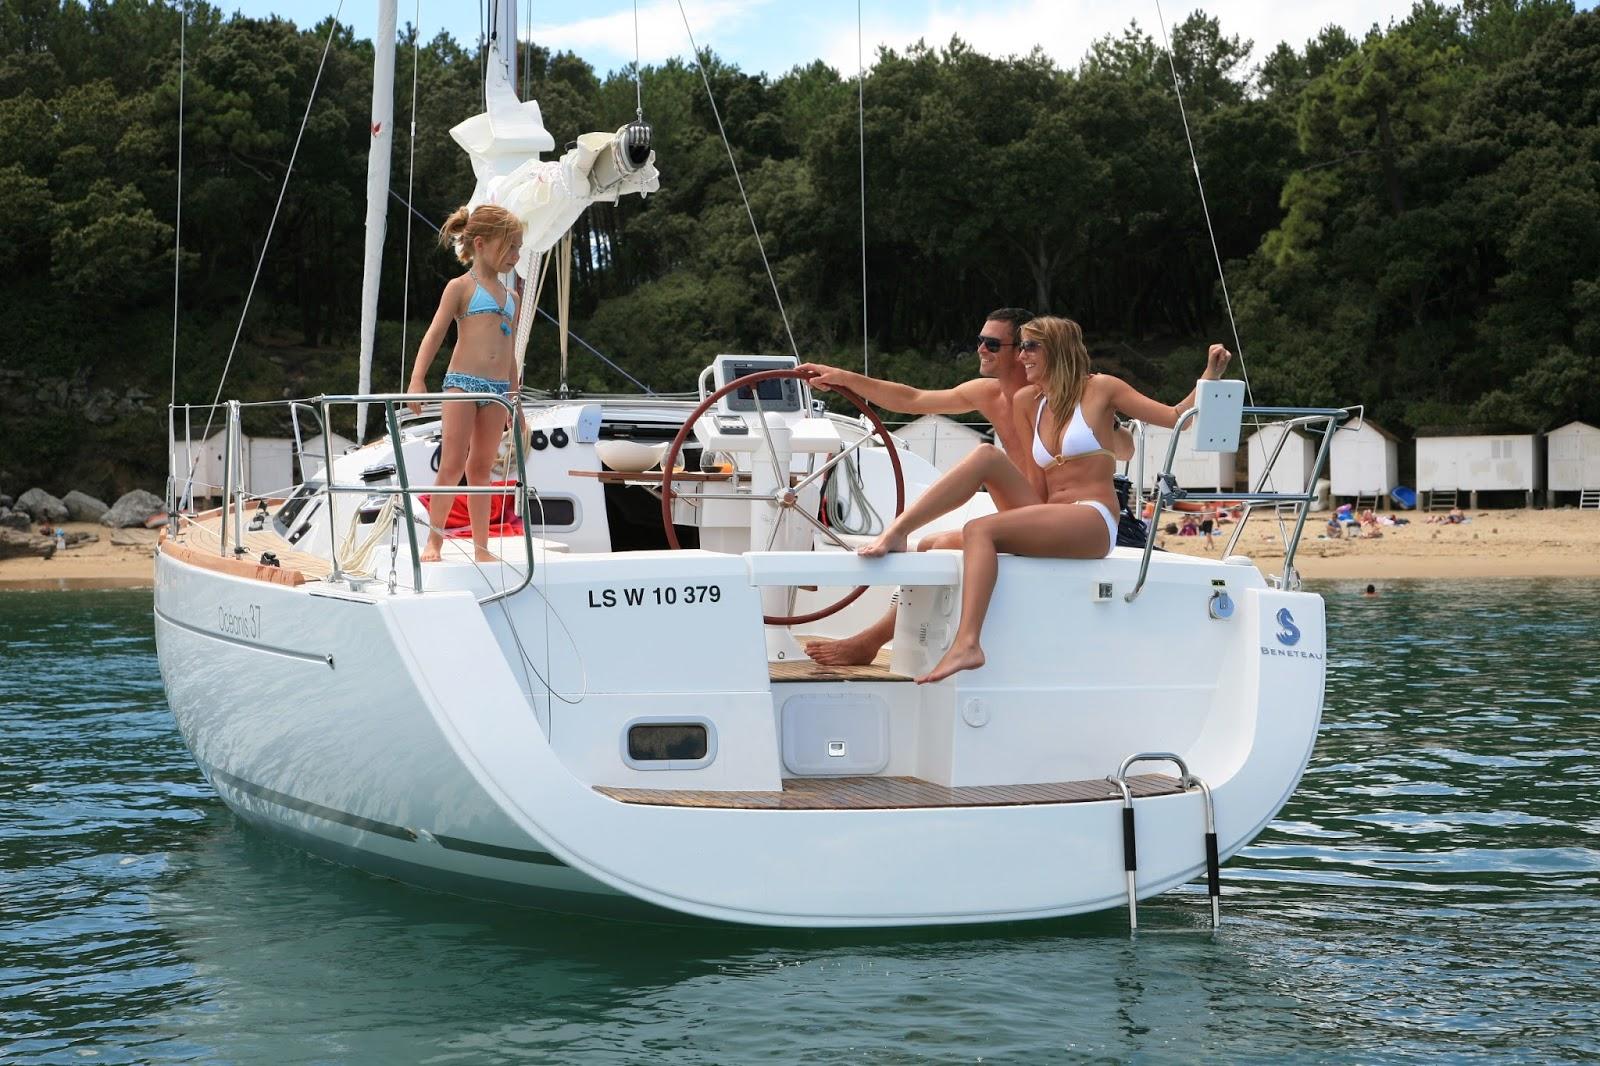 alquiler de veleros baratos en ibiza. alquiler veleros baratos ibiza. alquiler de barcos en ibiza. alquiler barcos ibiza. alquilar yates en ibiza. barcos de alquiler en ibiza